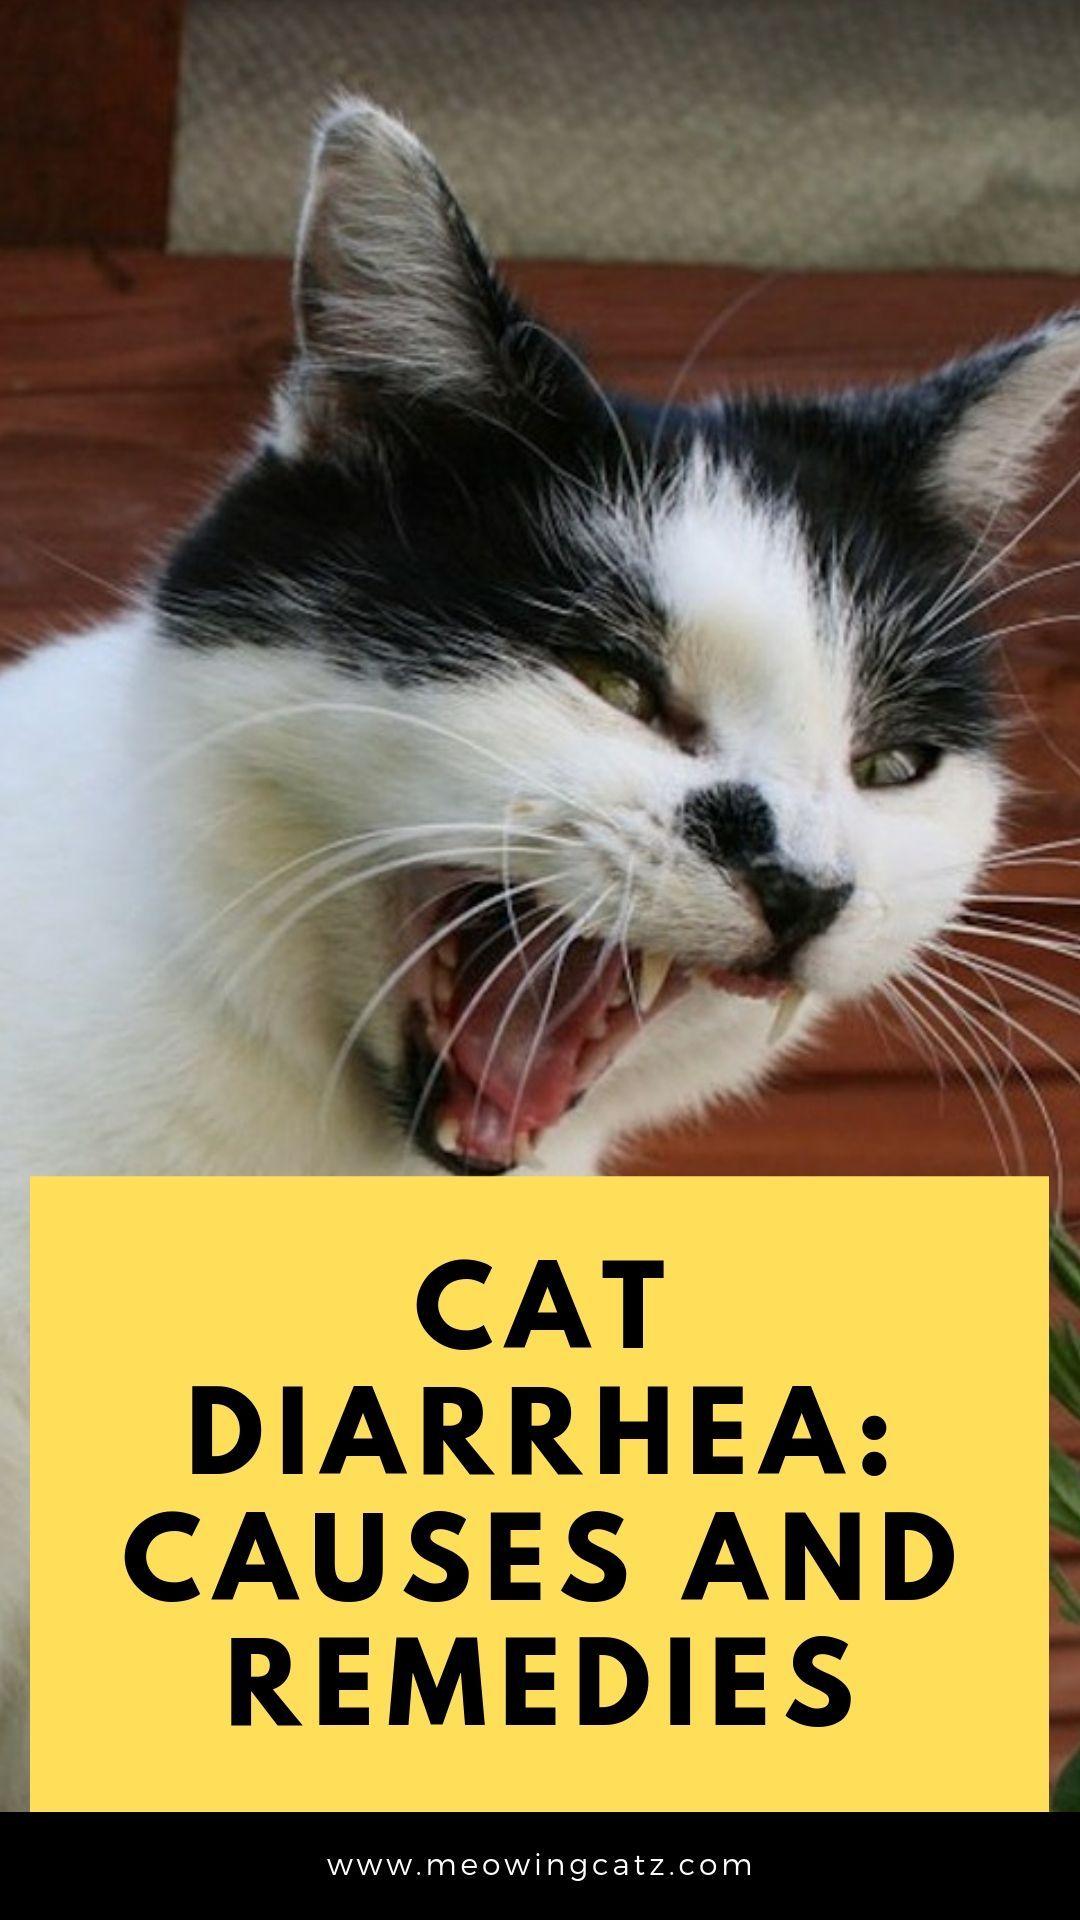 Cat Diarrhea Causes And Remedies Cat Diarrhea Diarrhea Remedies Diarrhea Causes